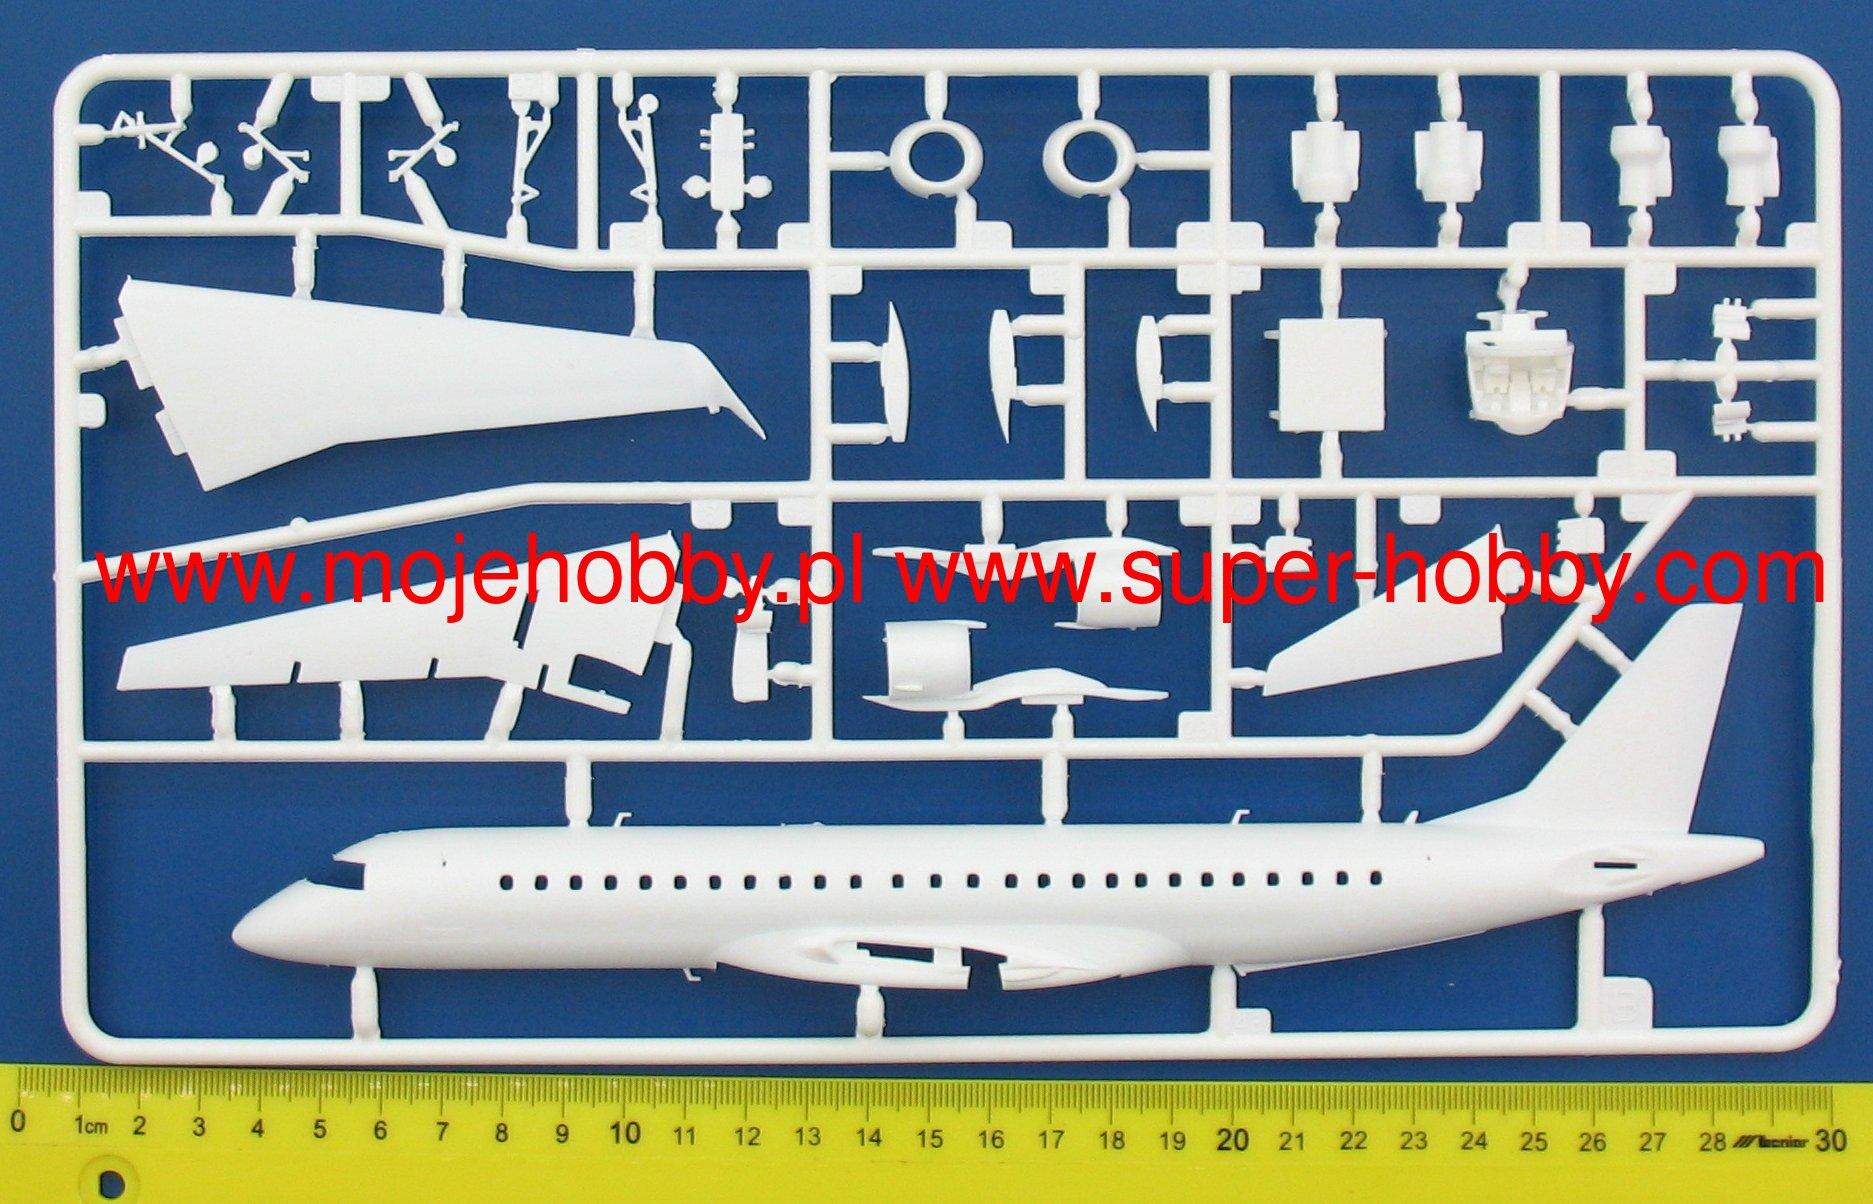 Neu Lufthansa New Livery Revell 03883-1//144 Embraer 190